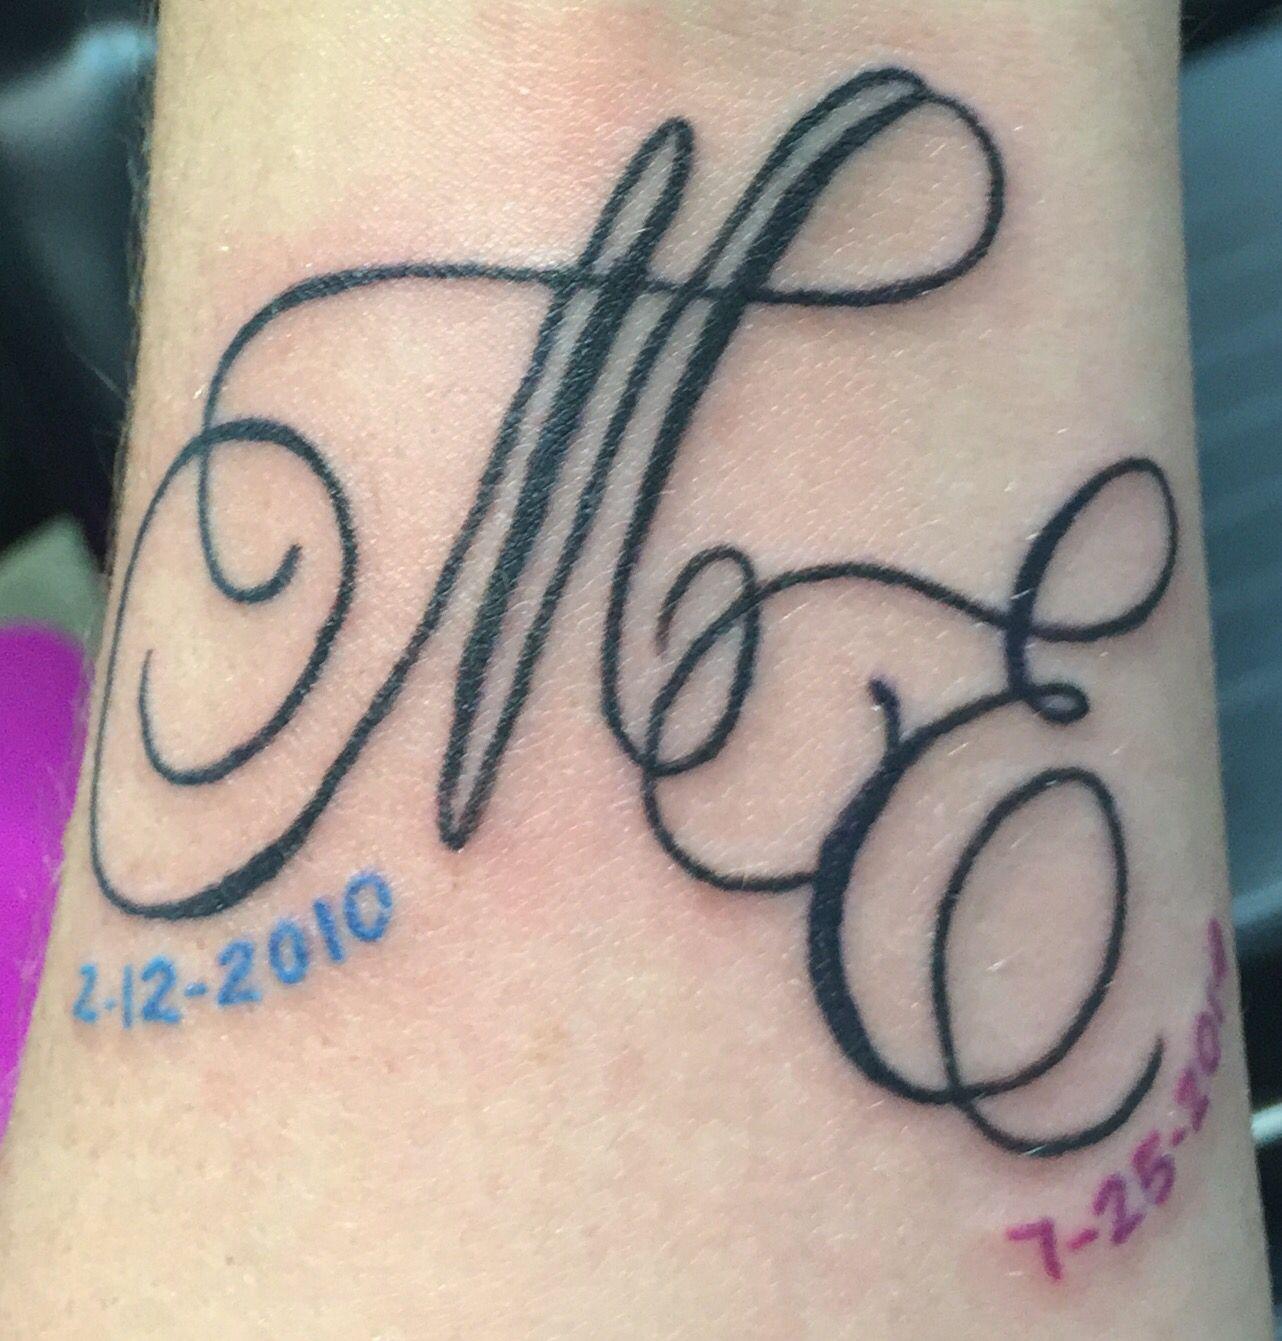 tatouage femme initiale c et v